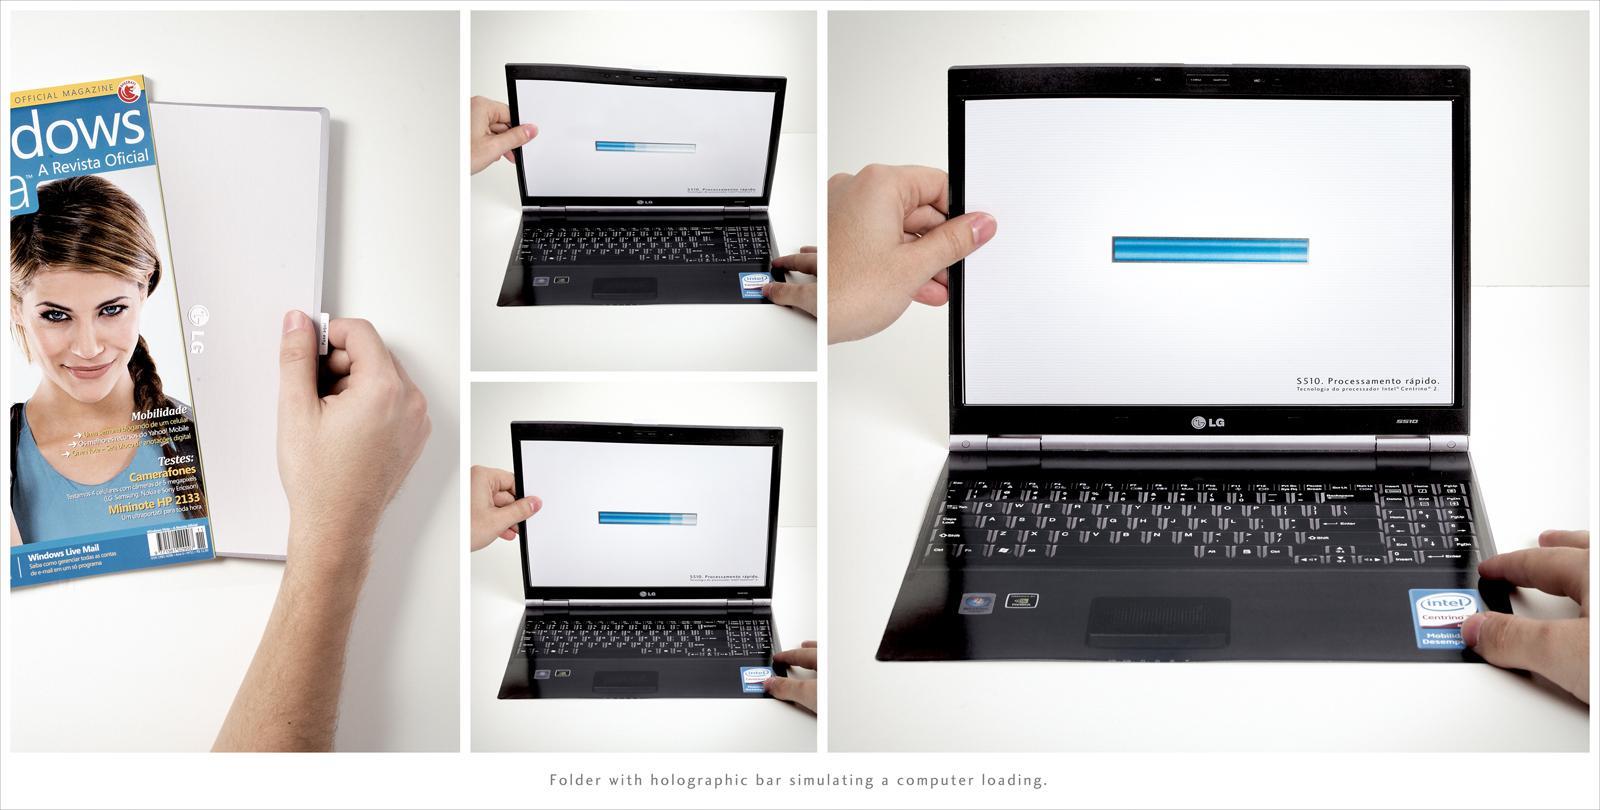 LG Direct Ad -  LG's fastest processor